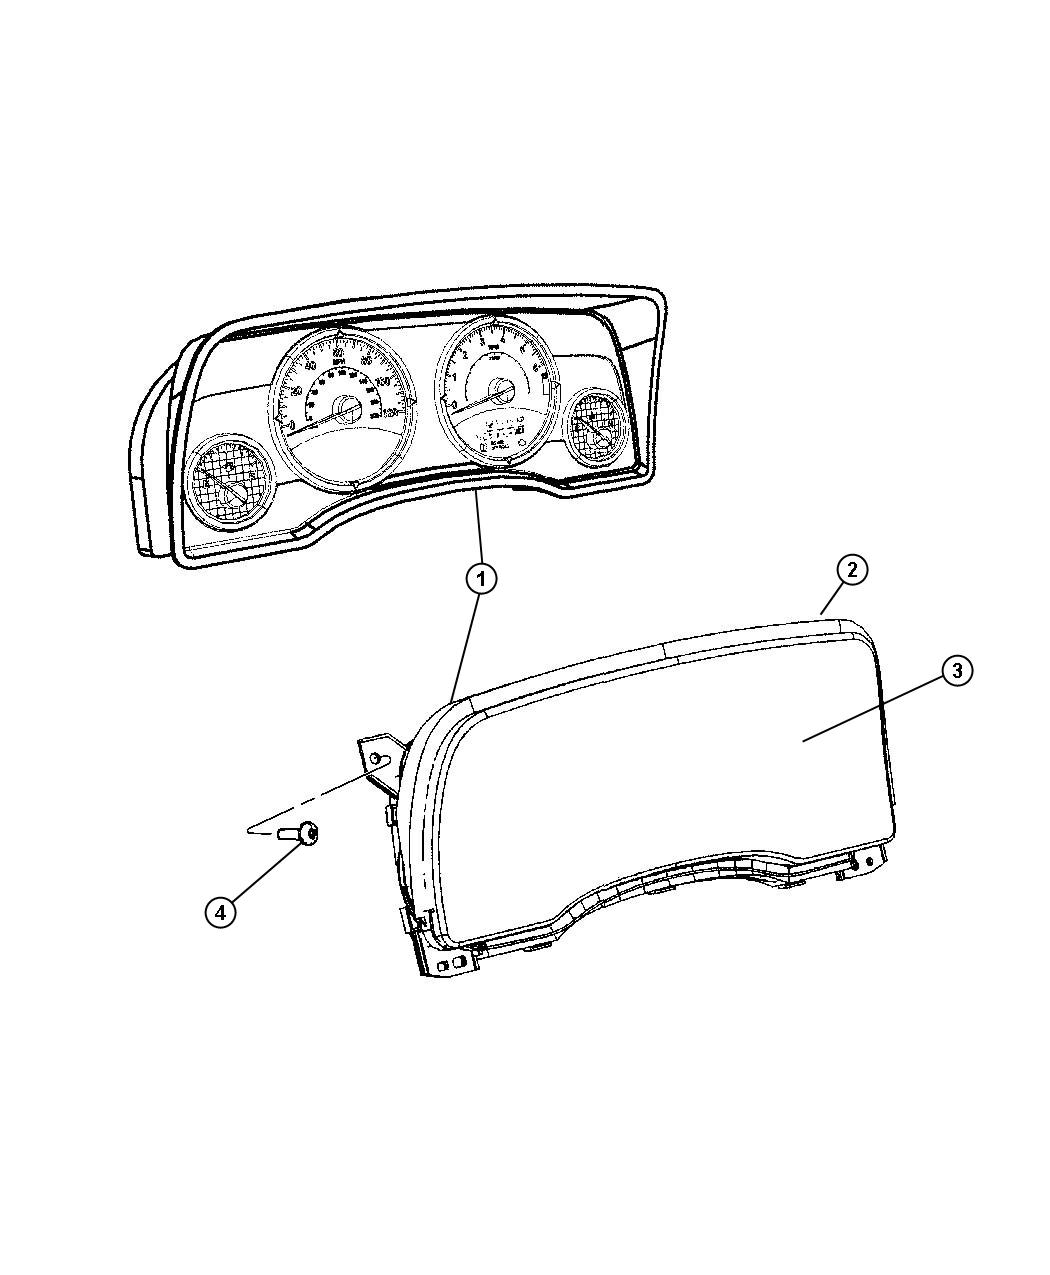 2009 Jeep Compass Cluster. Instrument panel. [jcb, je8